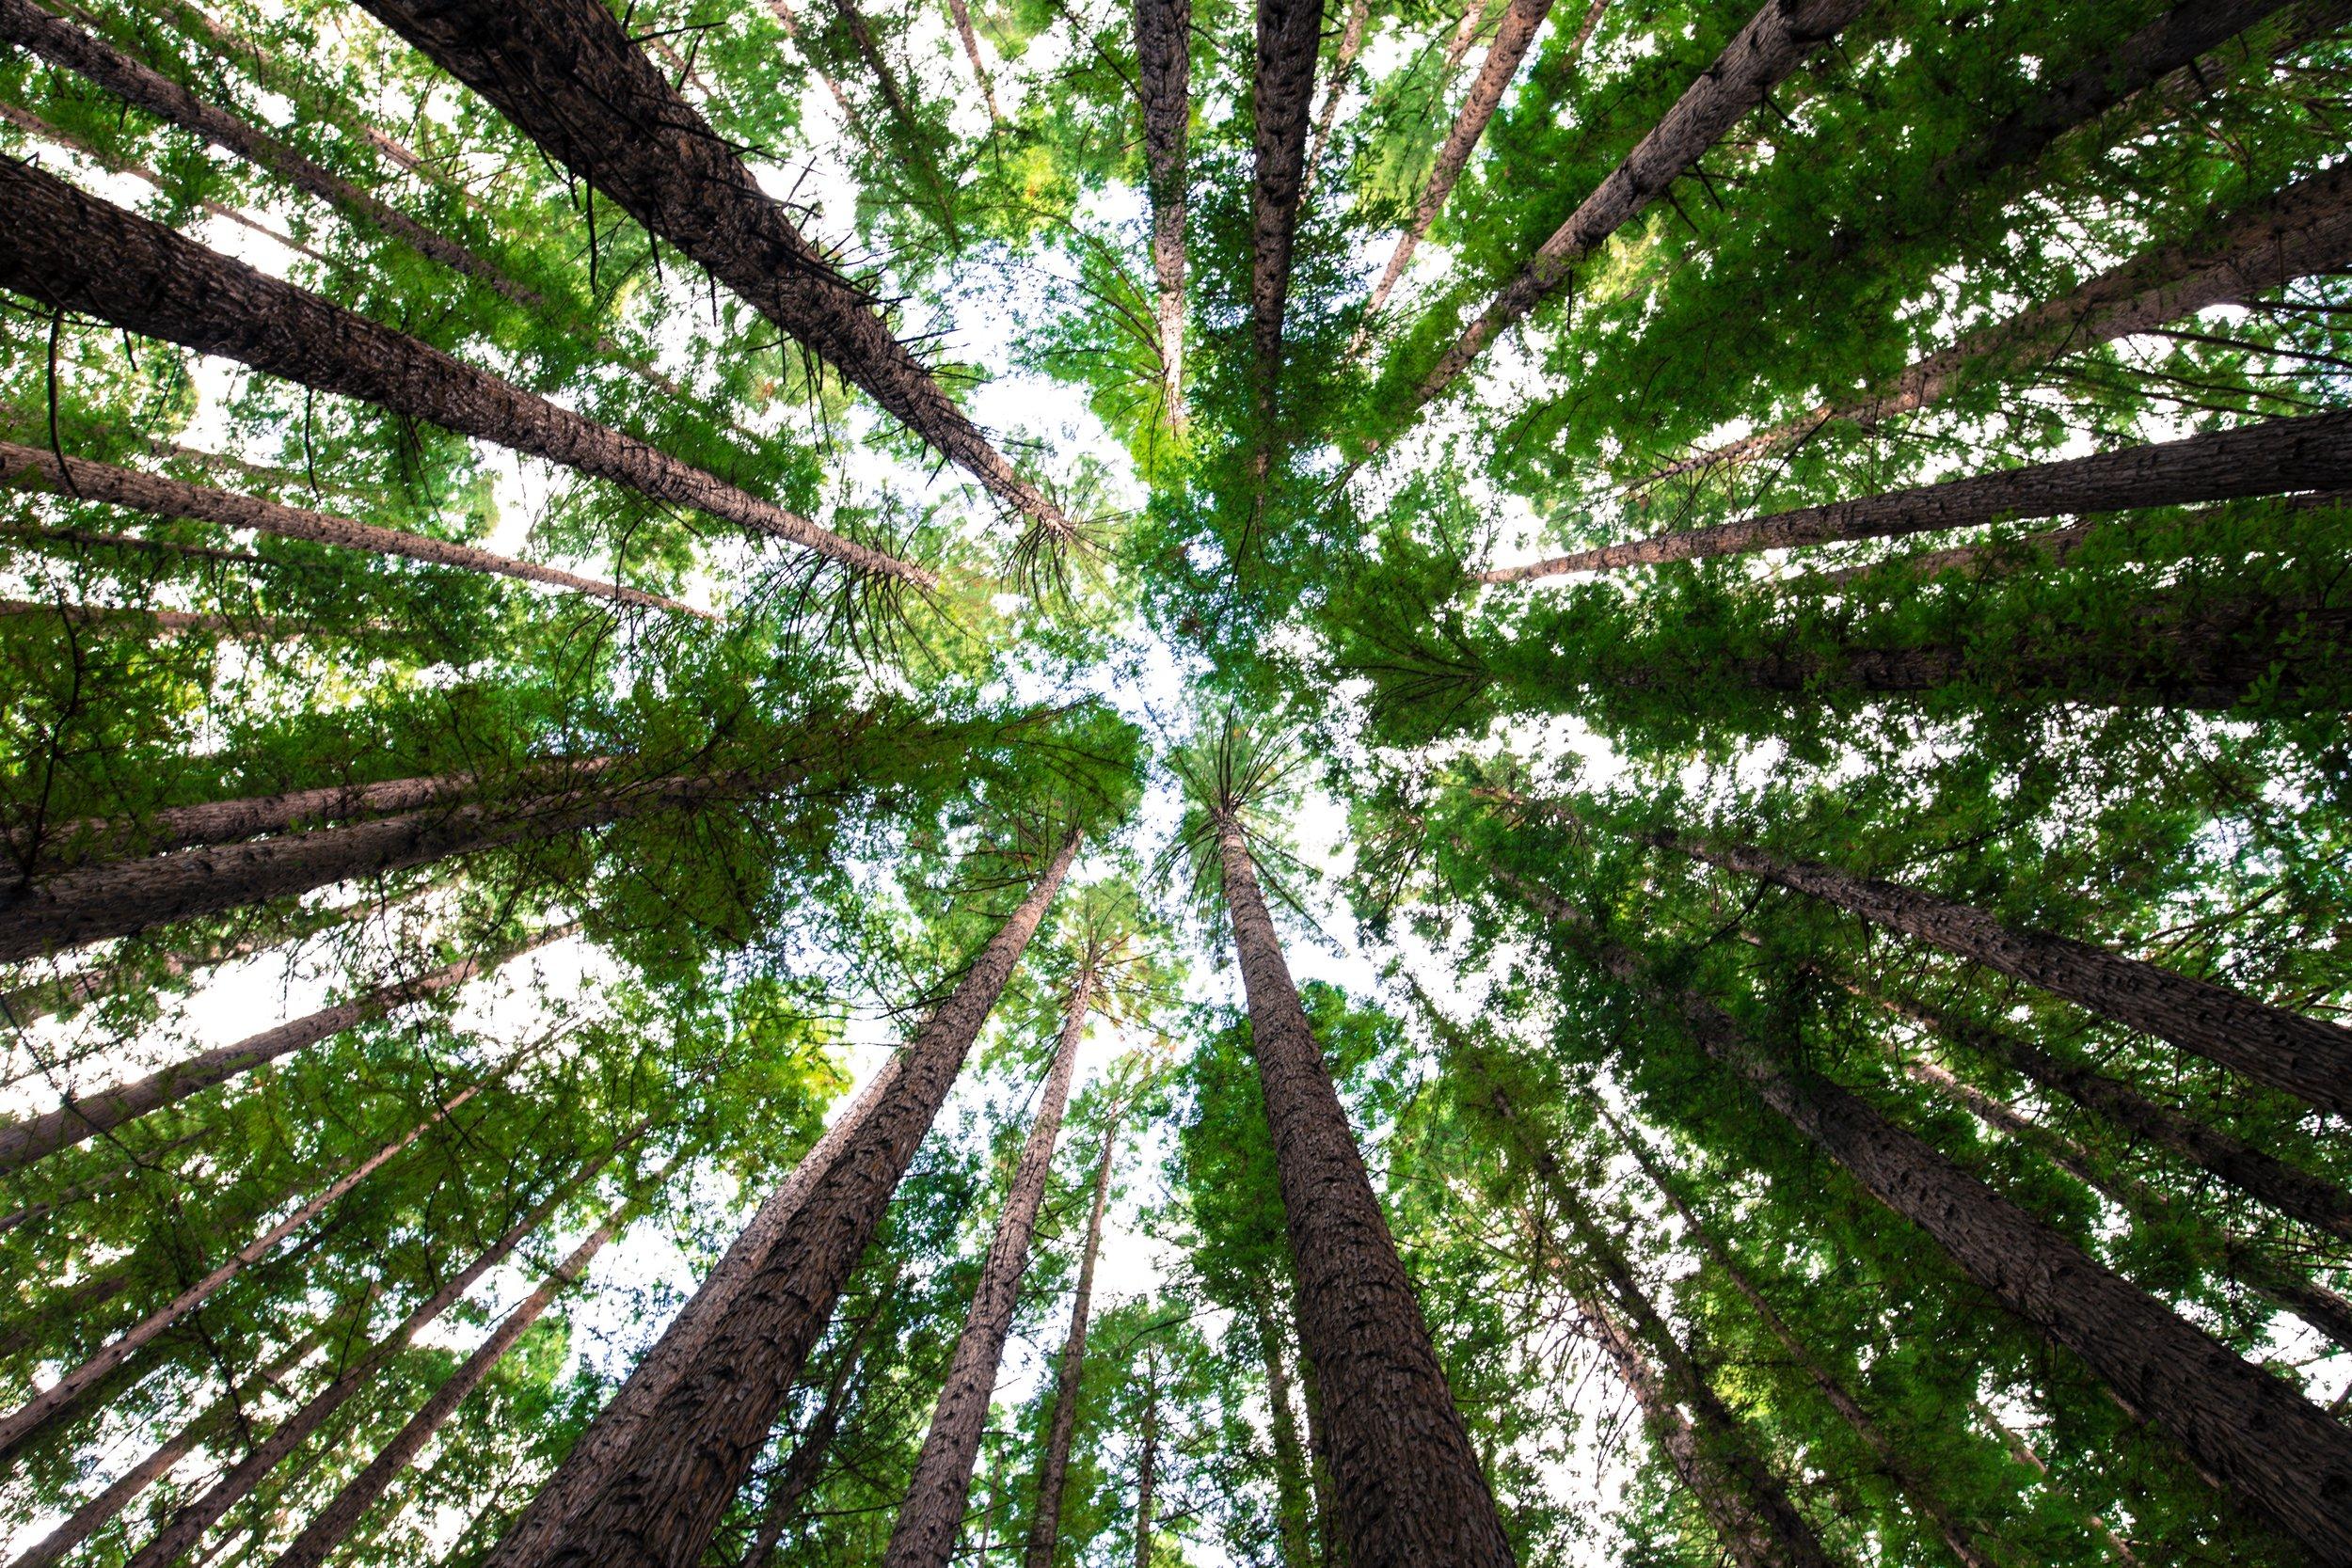 negative-space-tree-leaves-bark-forest-wood-green-anaud-mesureur.jpg